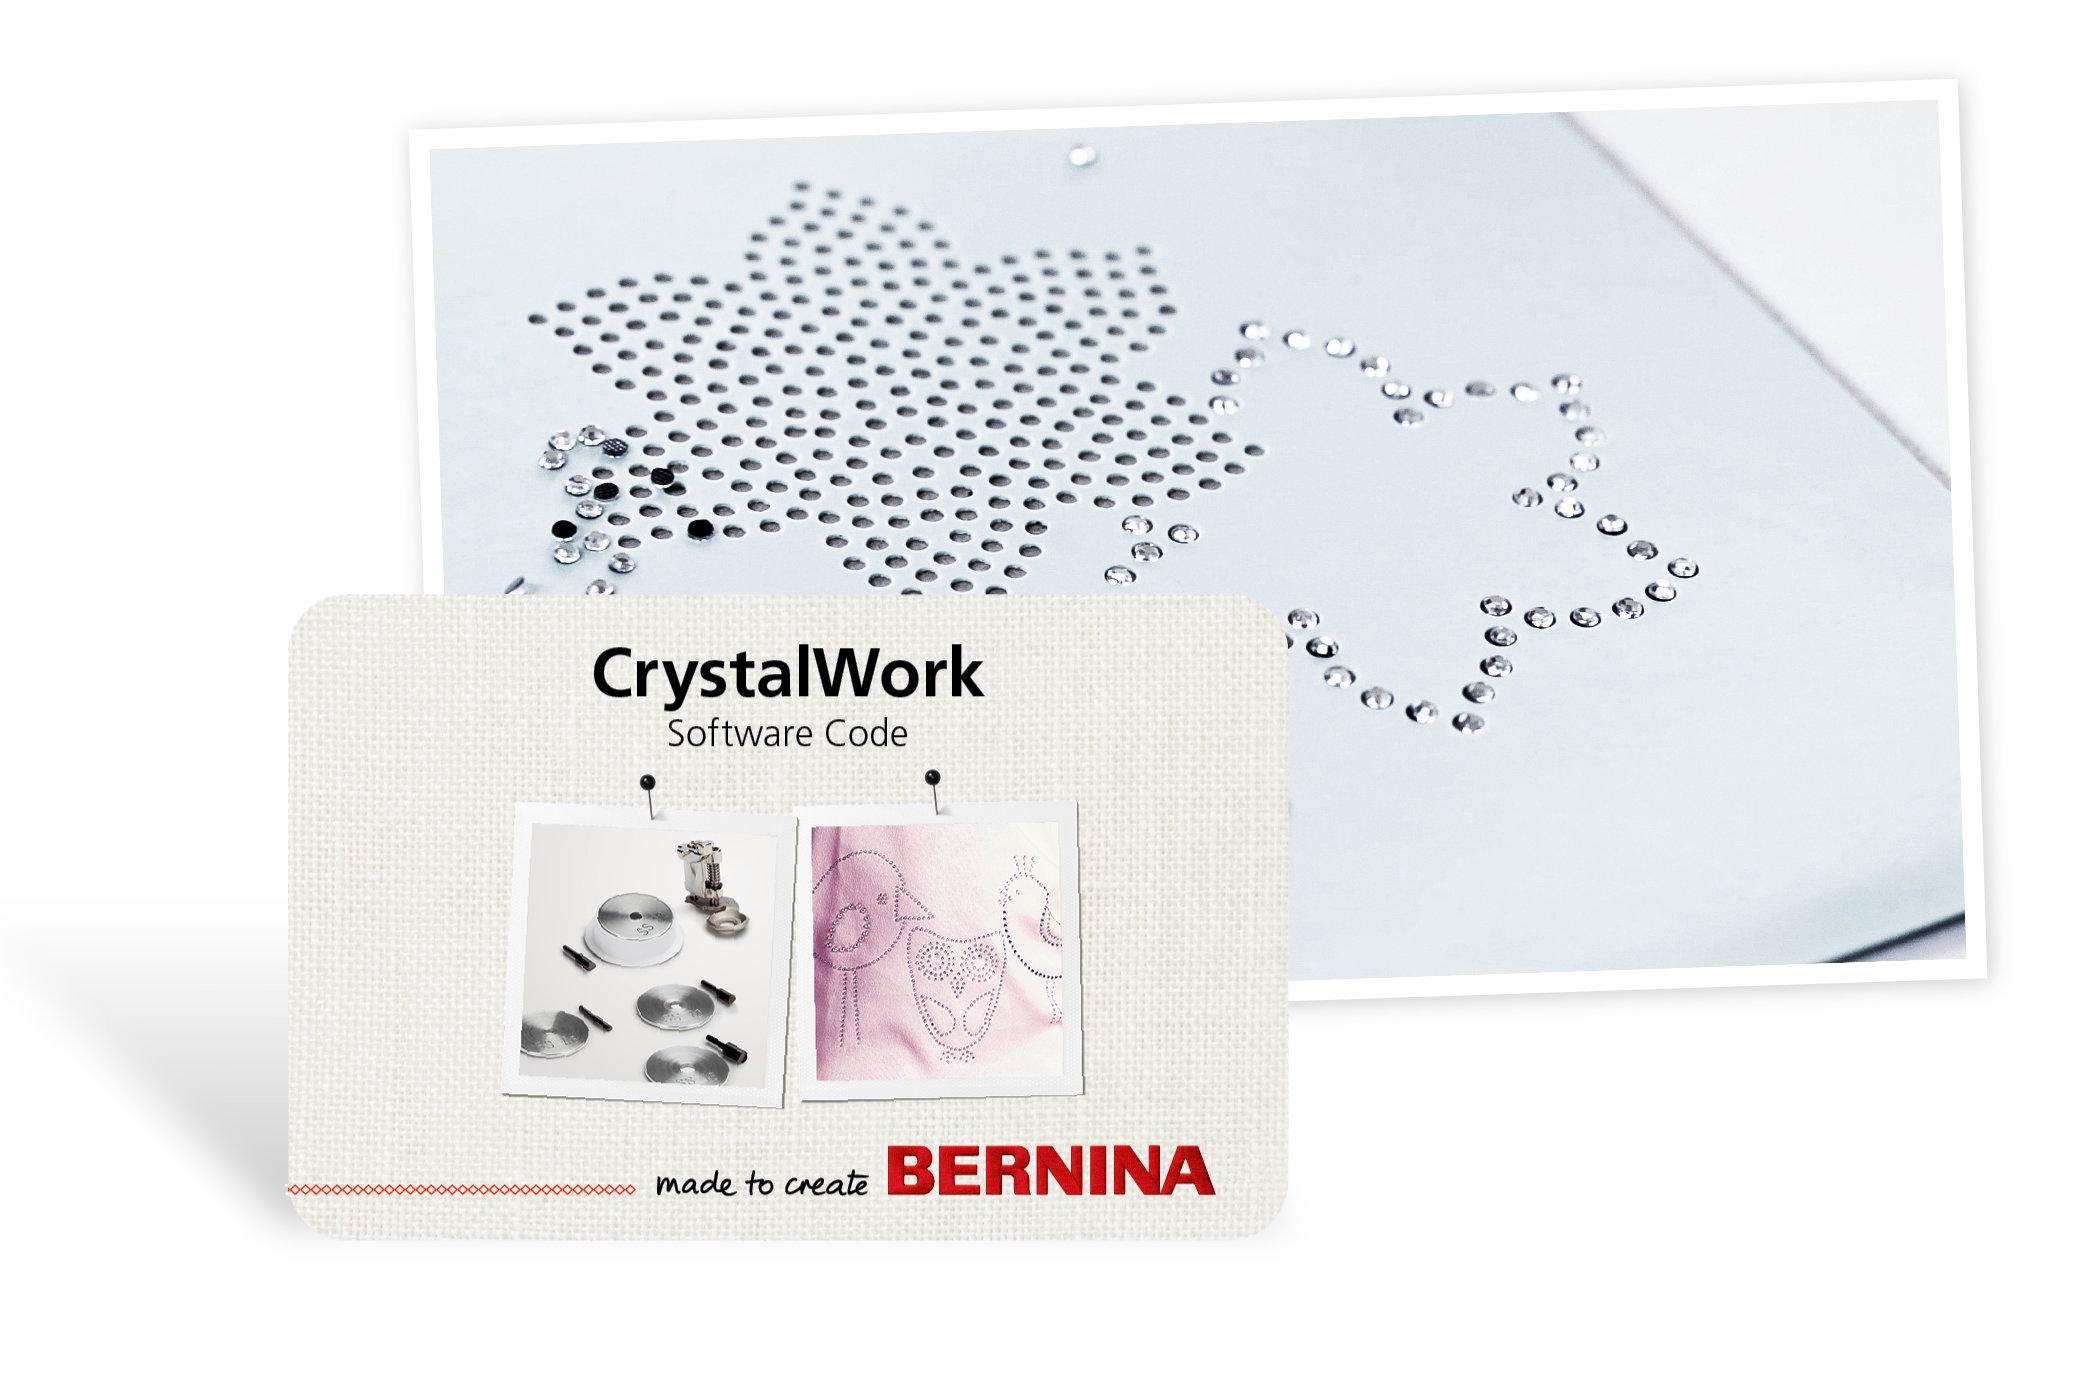 BERNINA CrystalWork: Creative Design Software